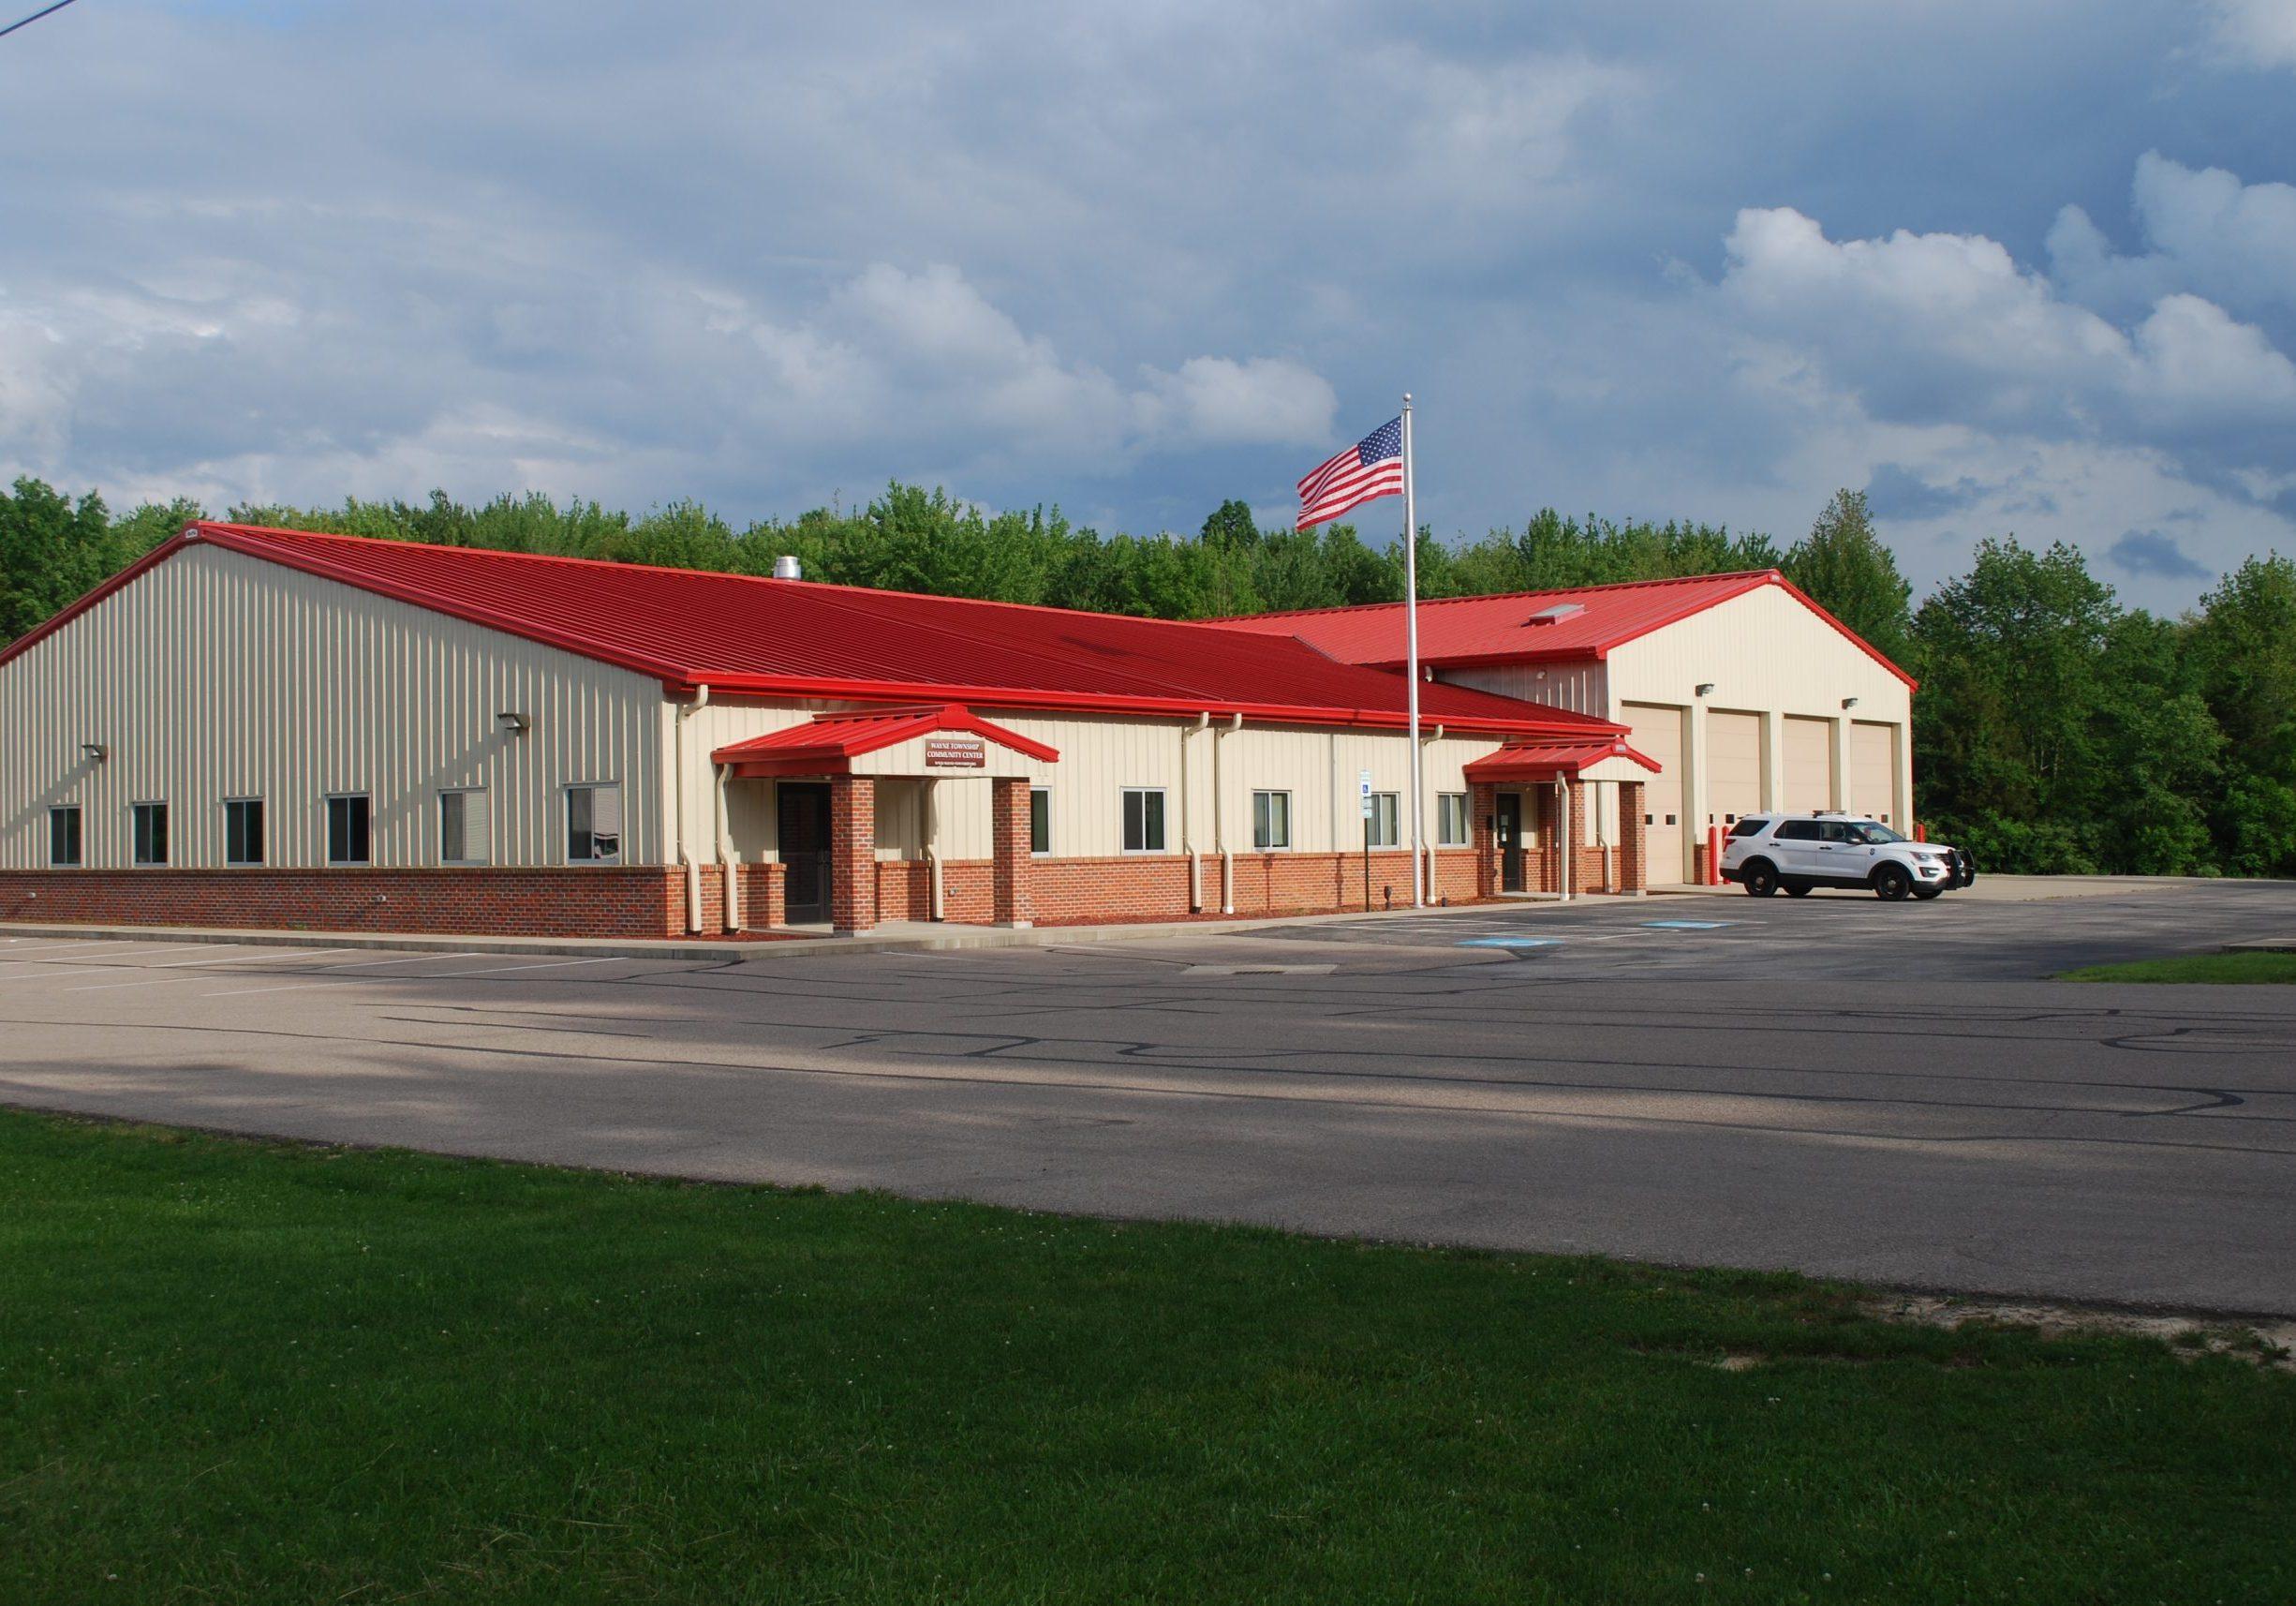 FireEMS station 56